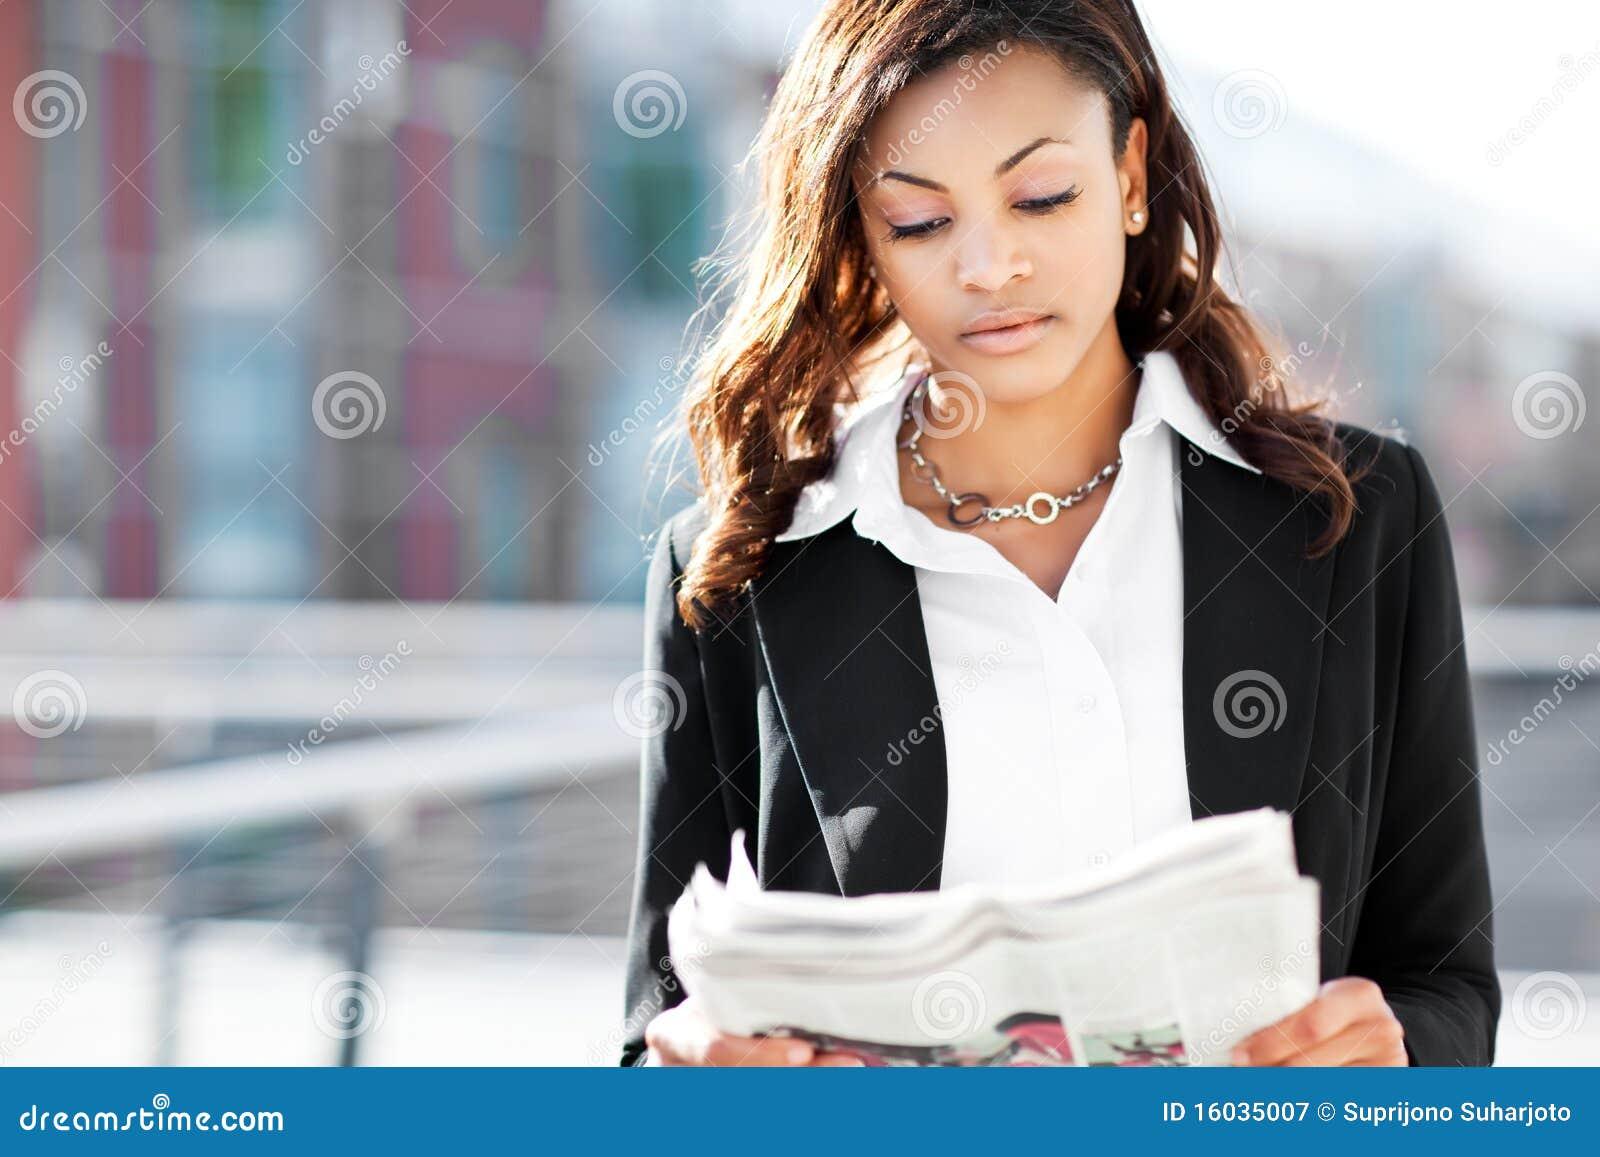 black businesswoman reading newspaper stock image - image of